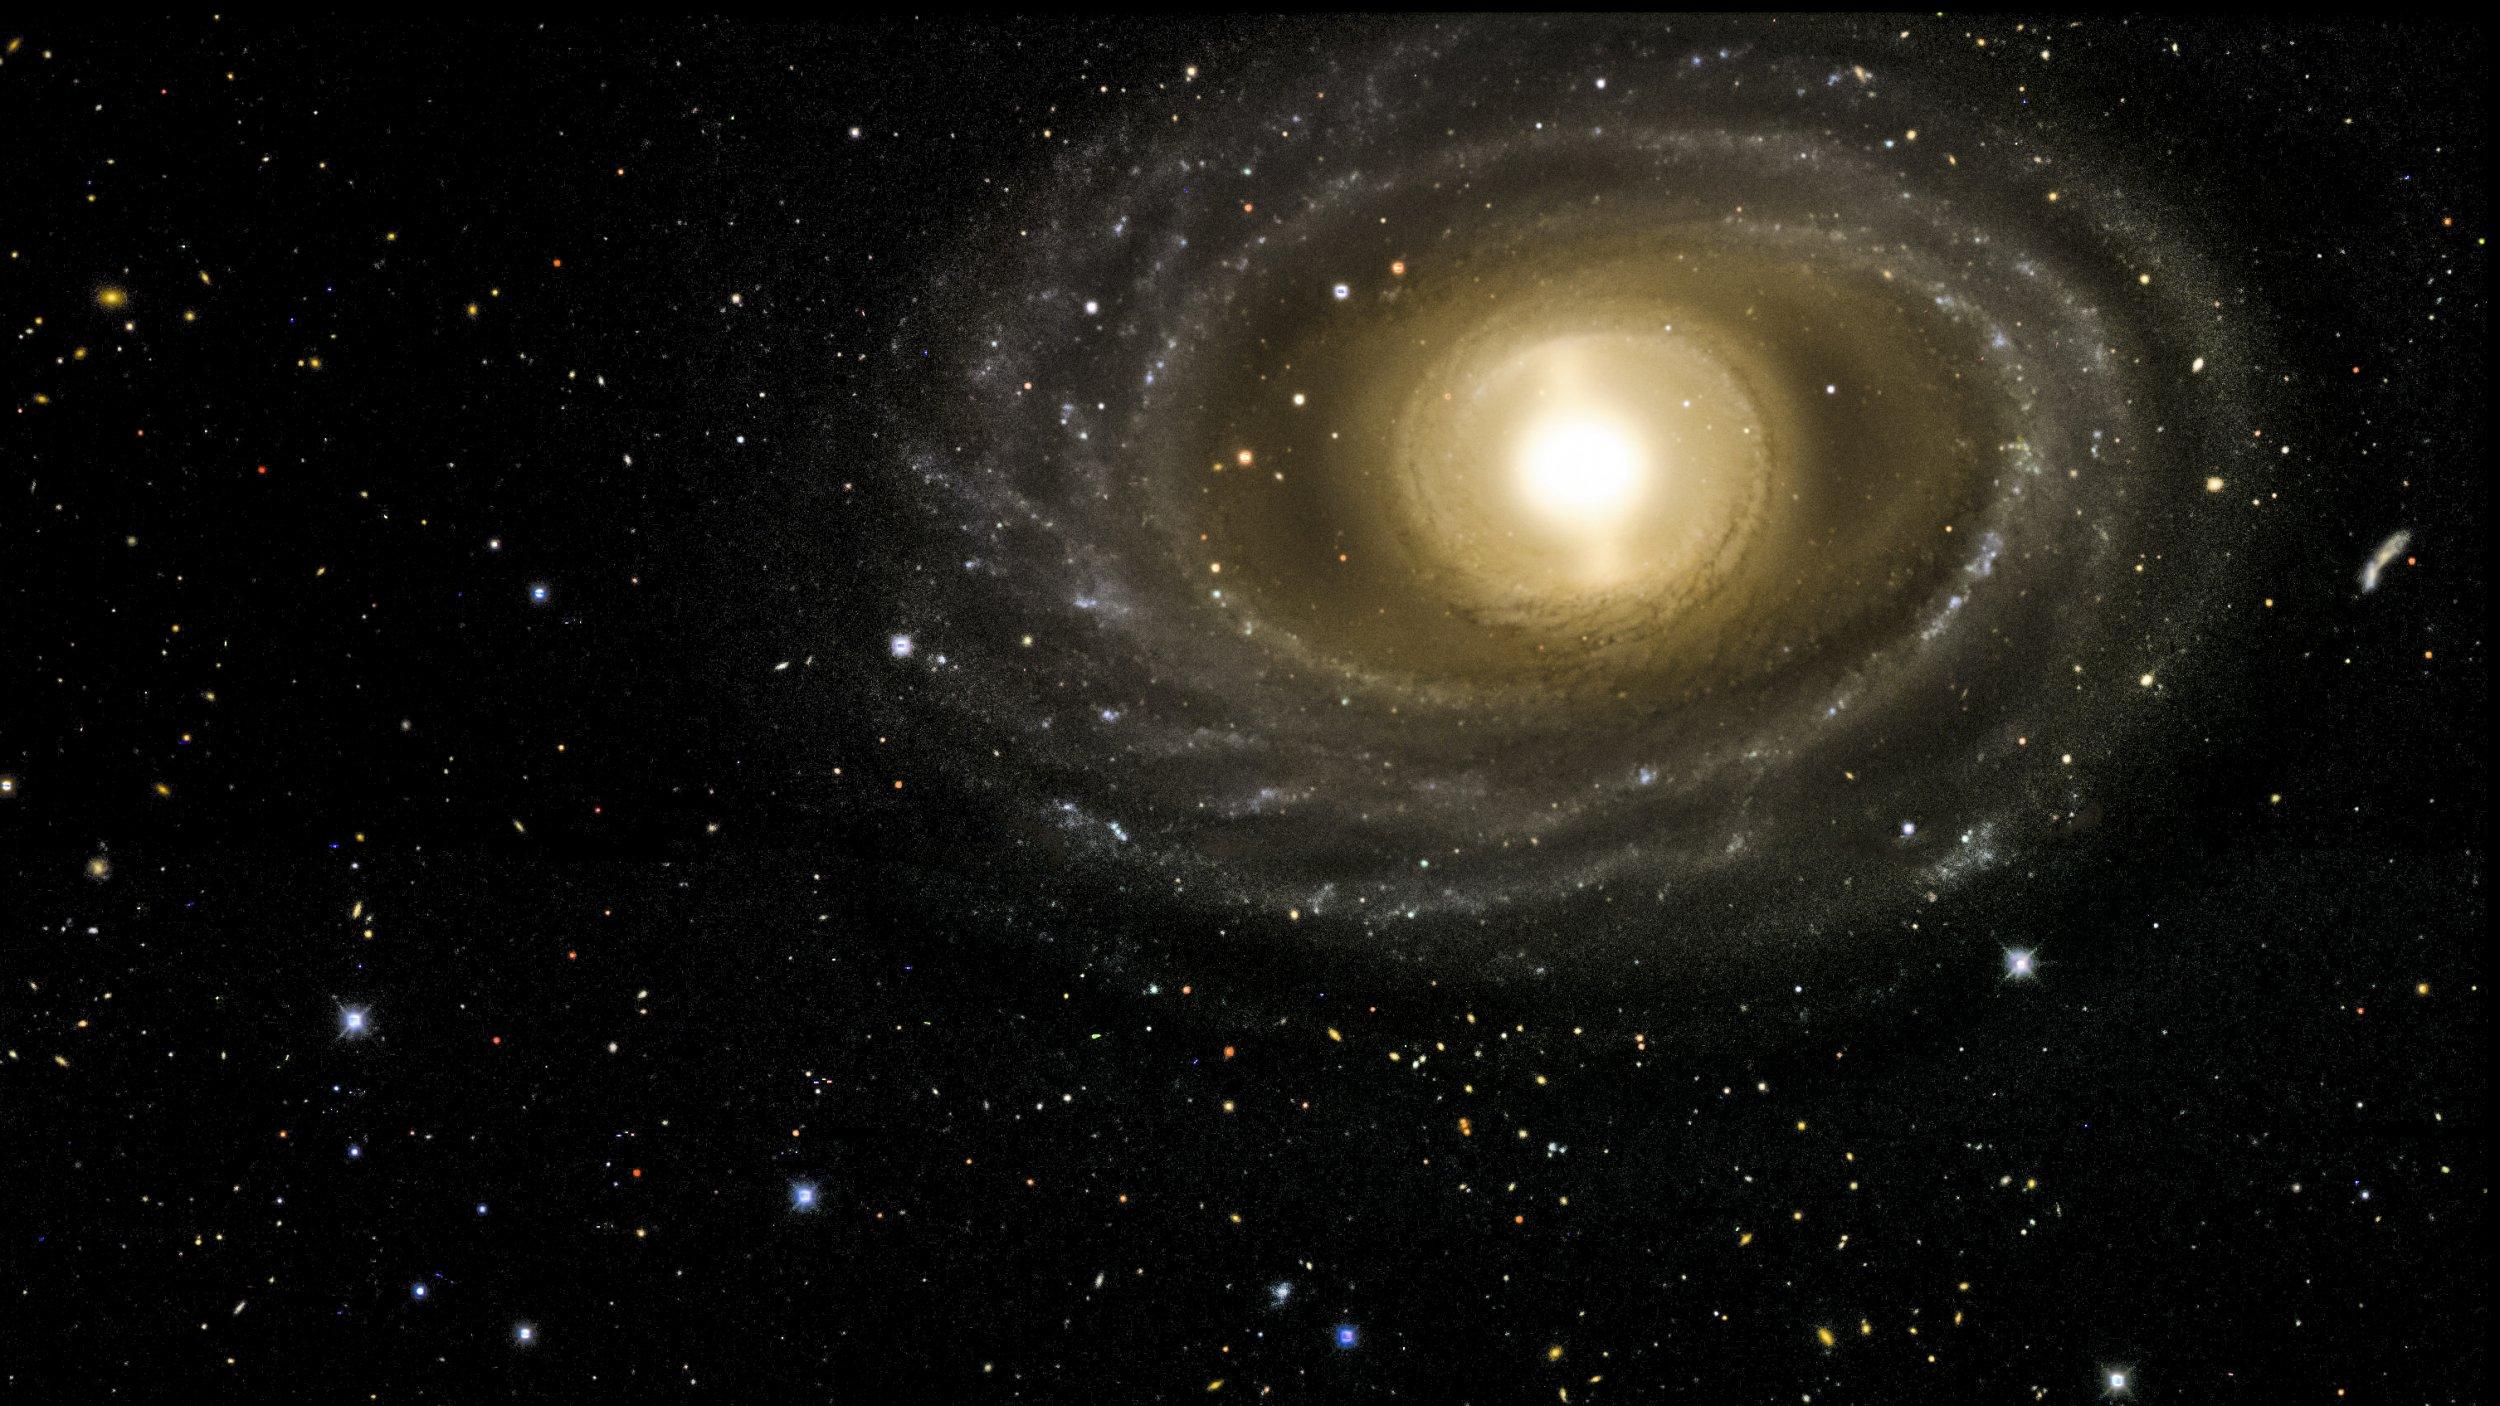 NGC 1398 galaxy